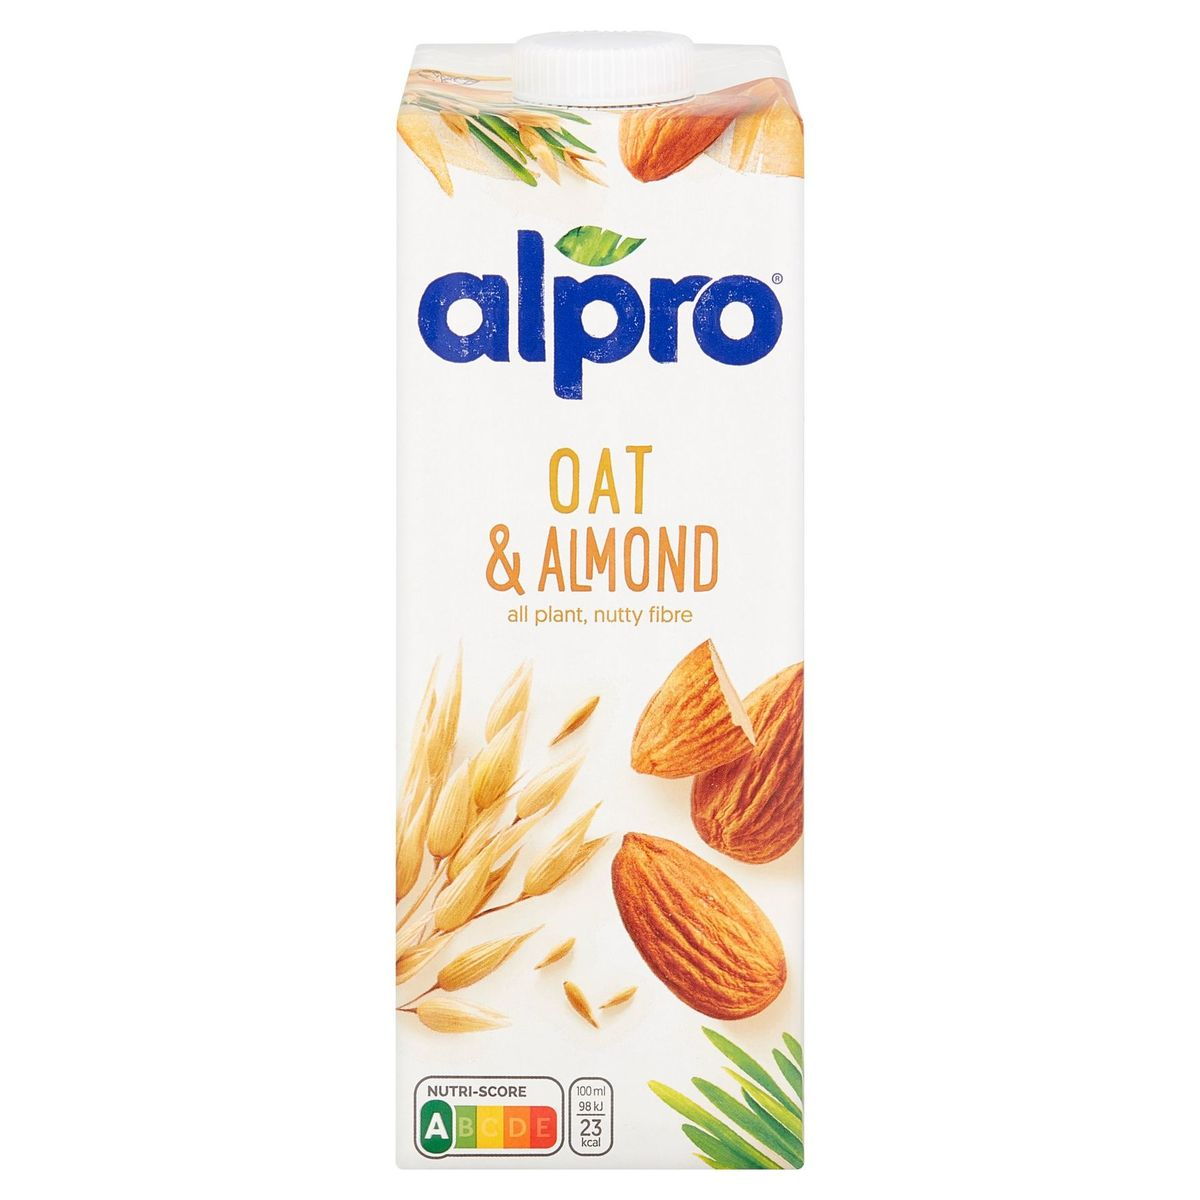 Alpro Oat & Almond 1 L